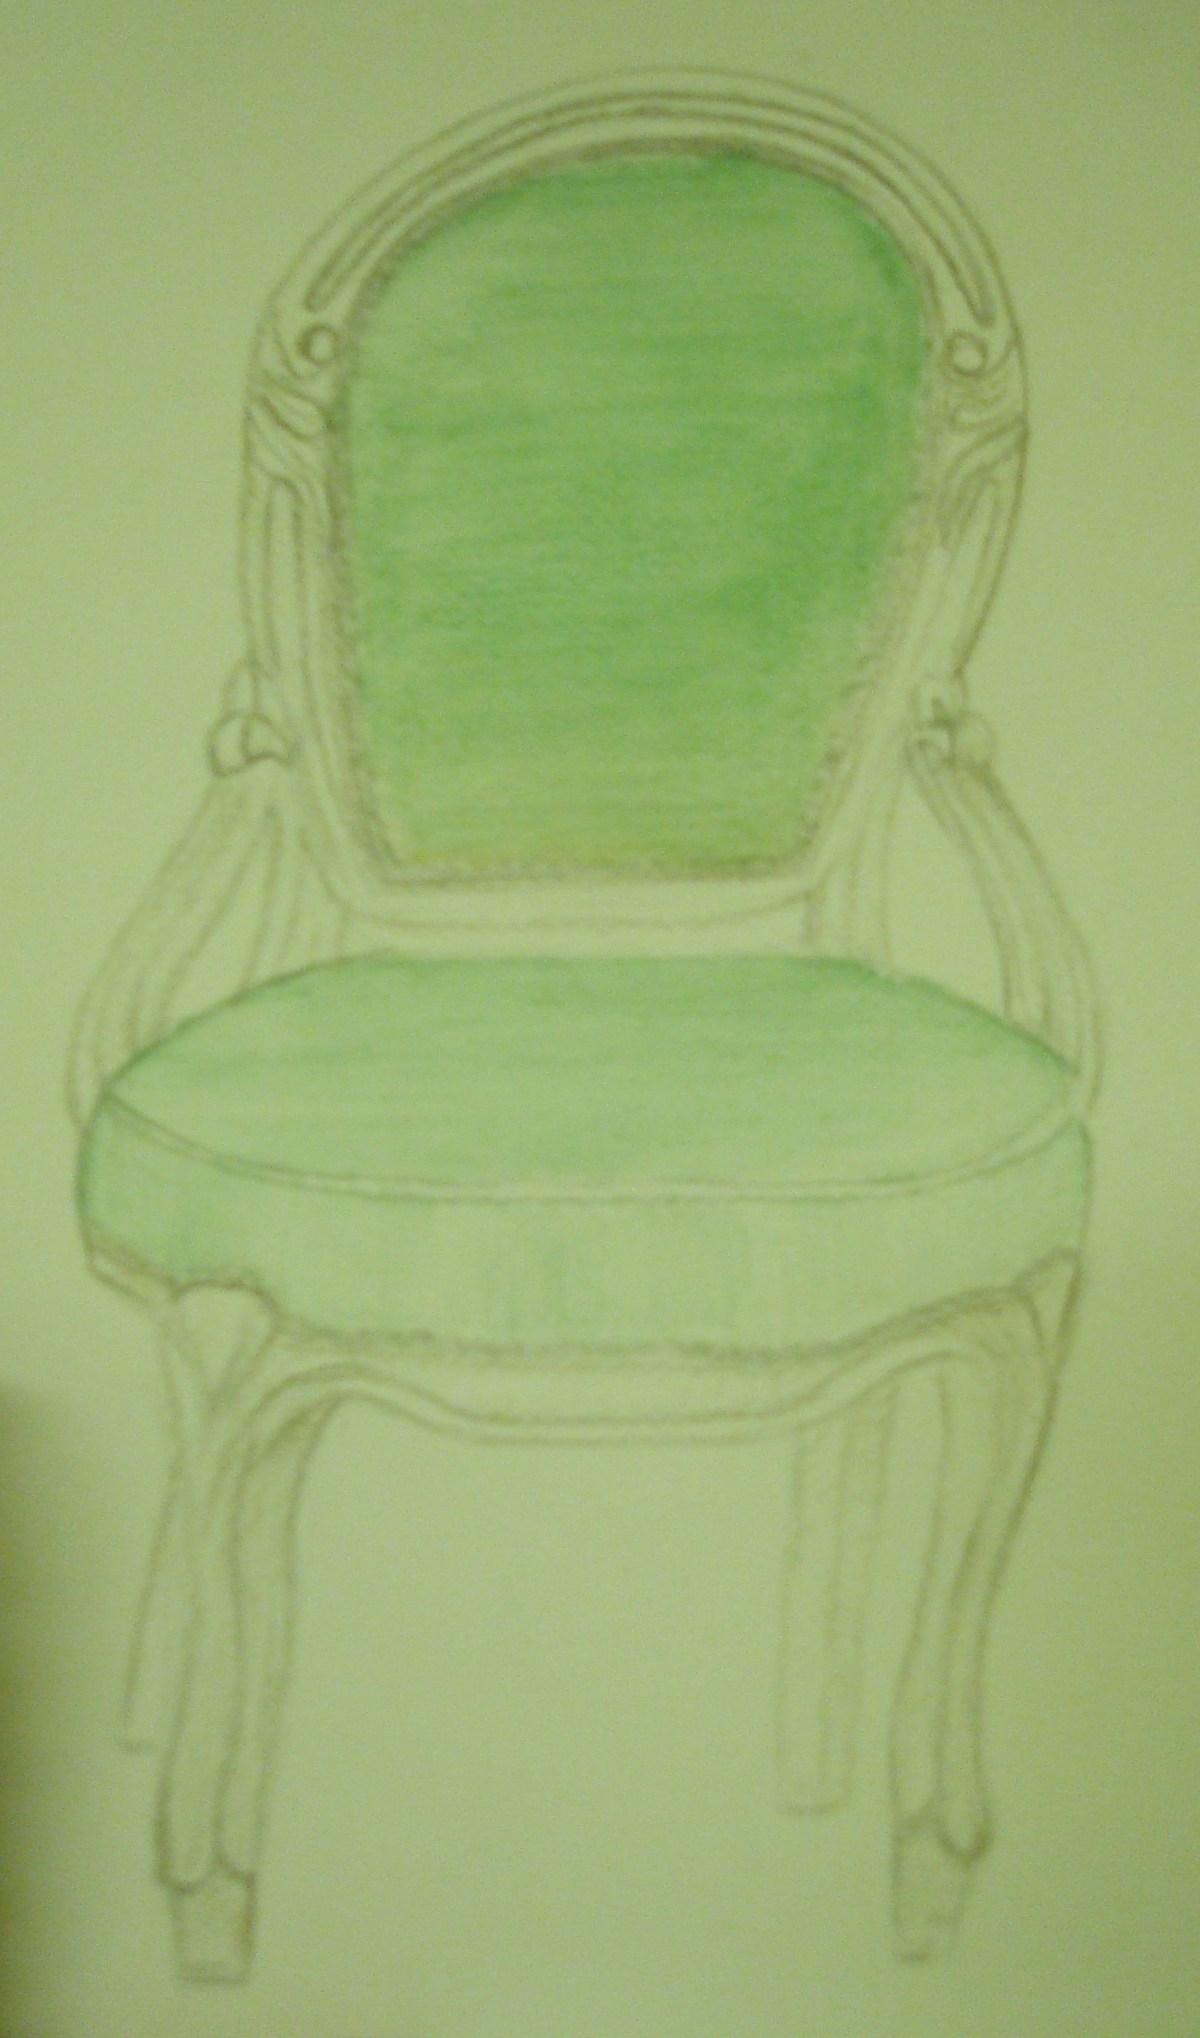 Antique chair drawing - Antique Chair Drawing